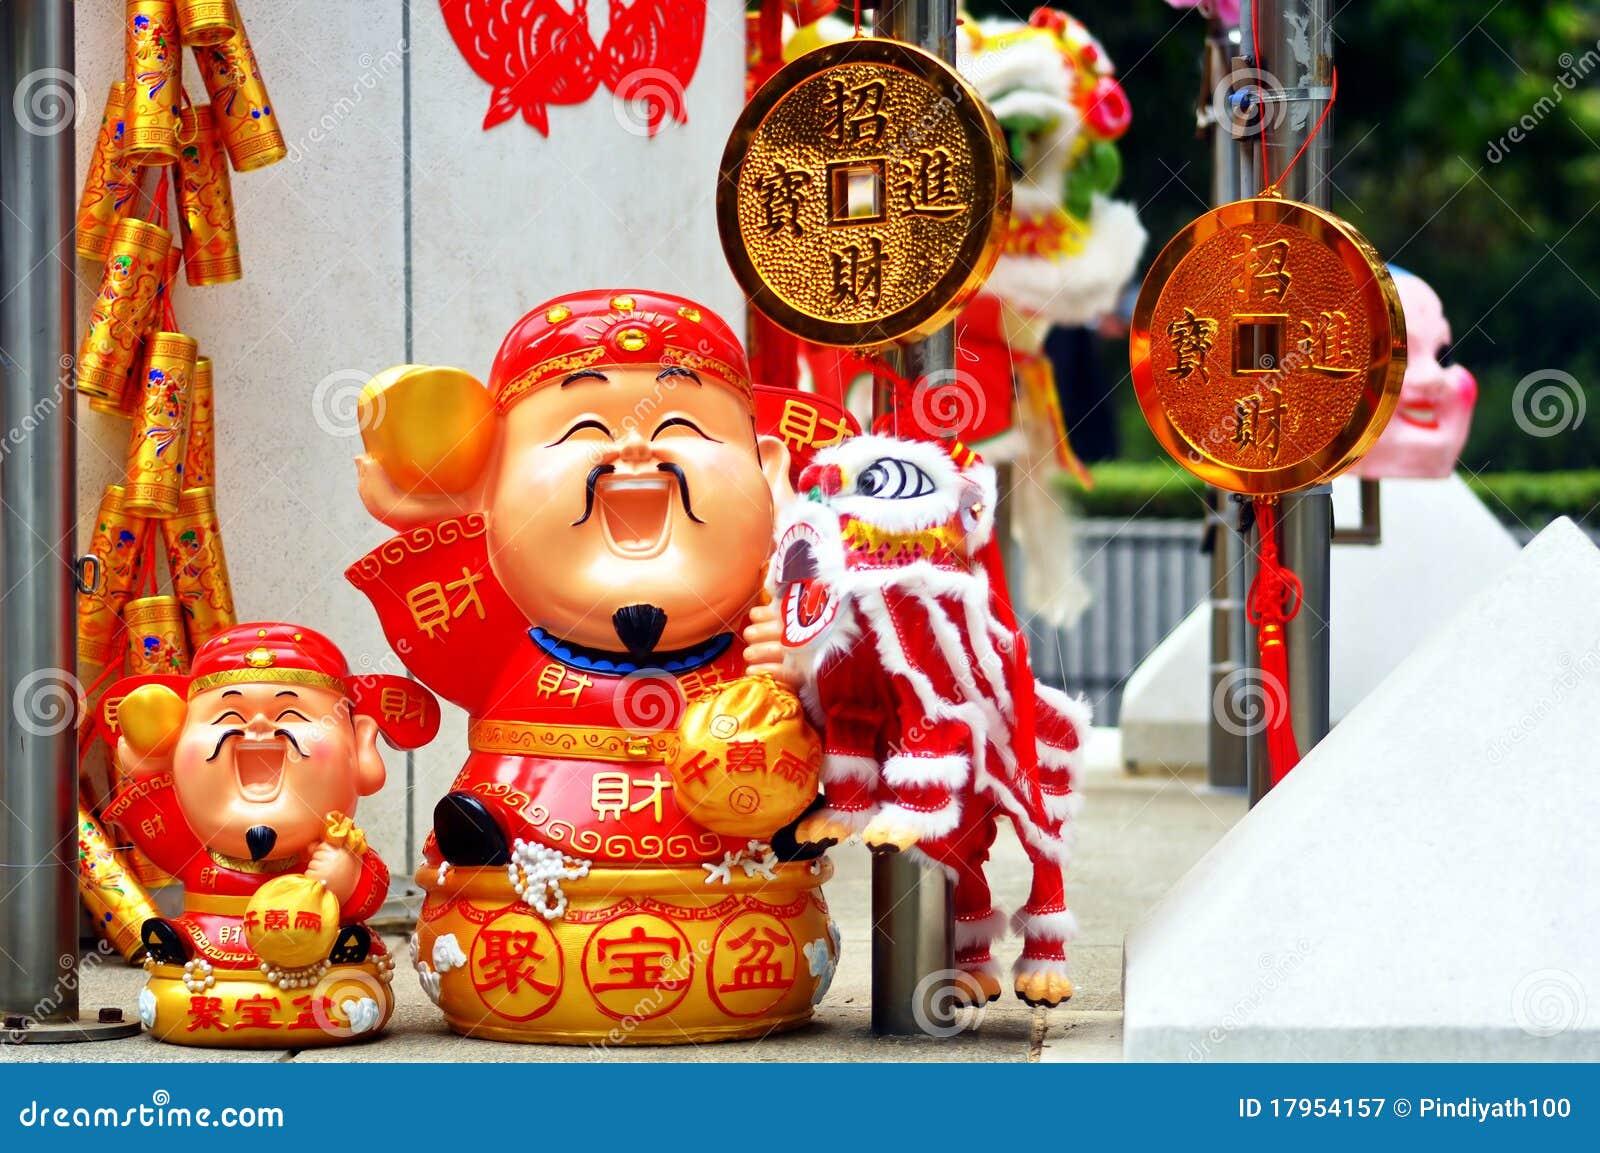 Chinese Lunar New Year... Ditan